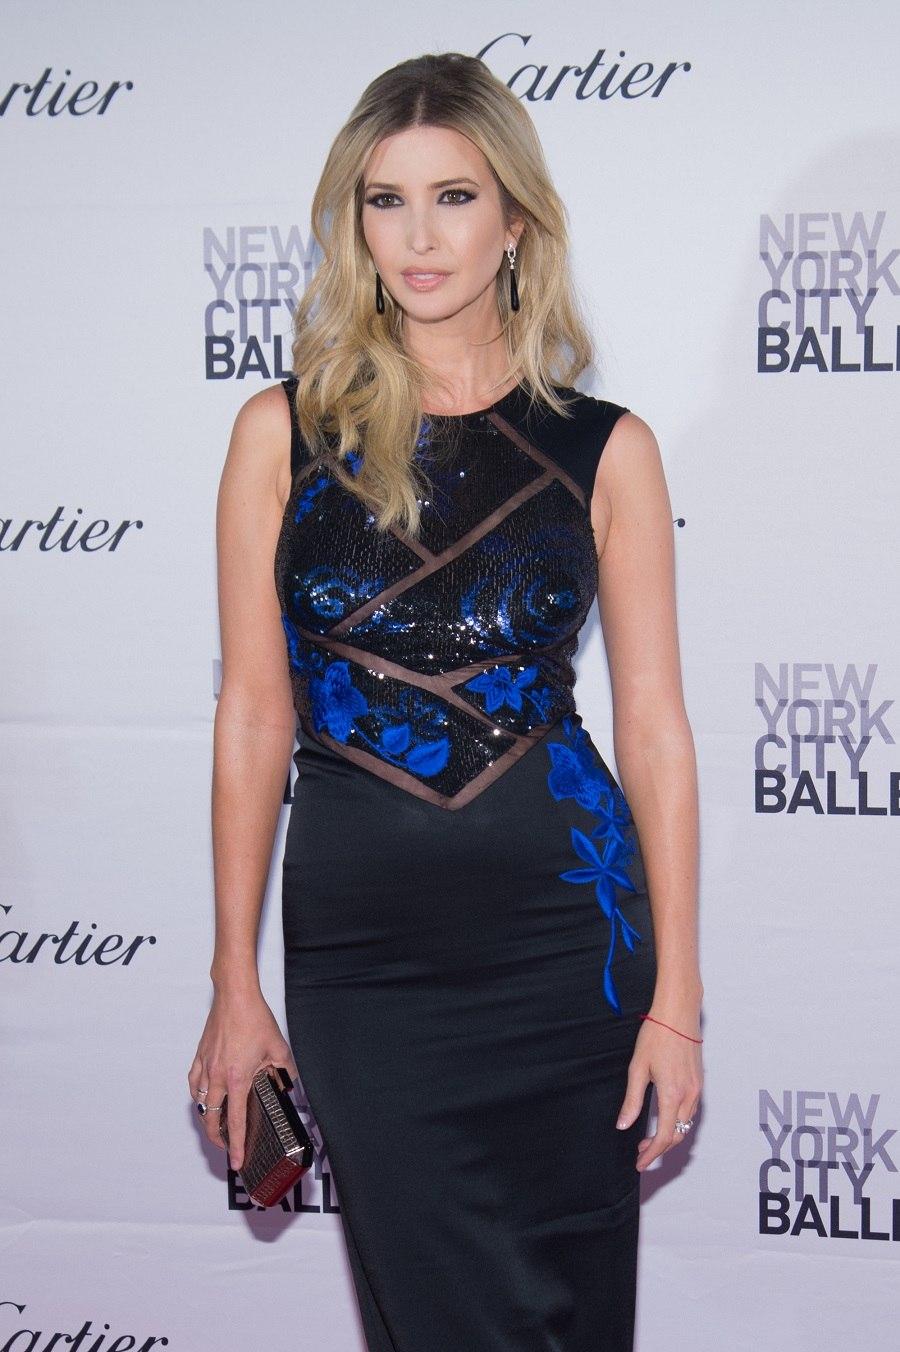 Ivanka Trump attends the 2015 New York City Ballet Fall Gala at the David H. Koch Theater